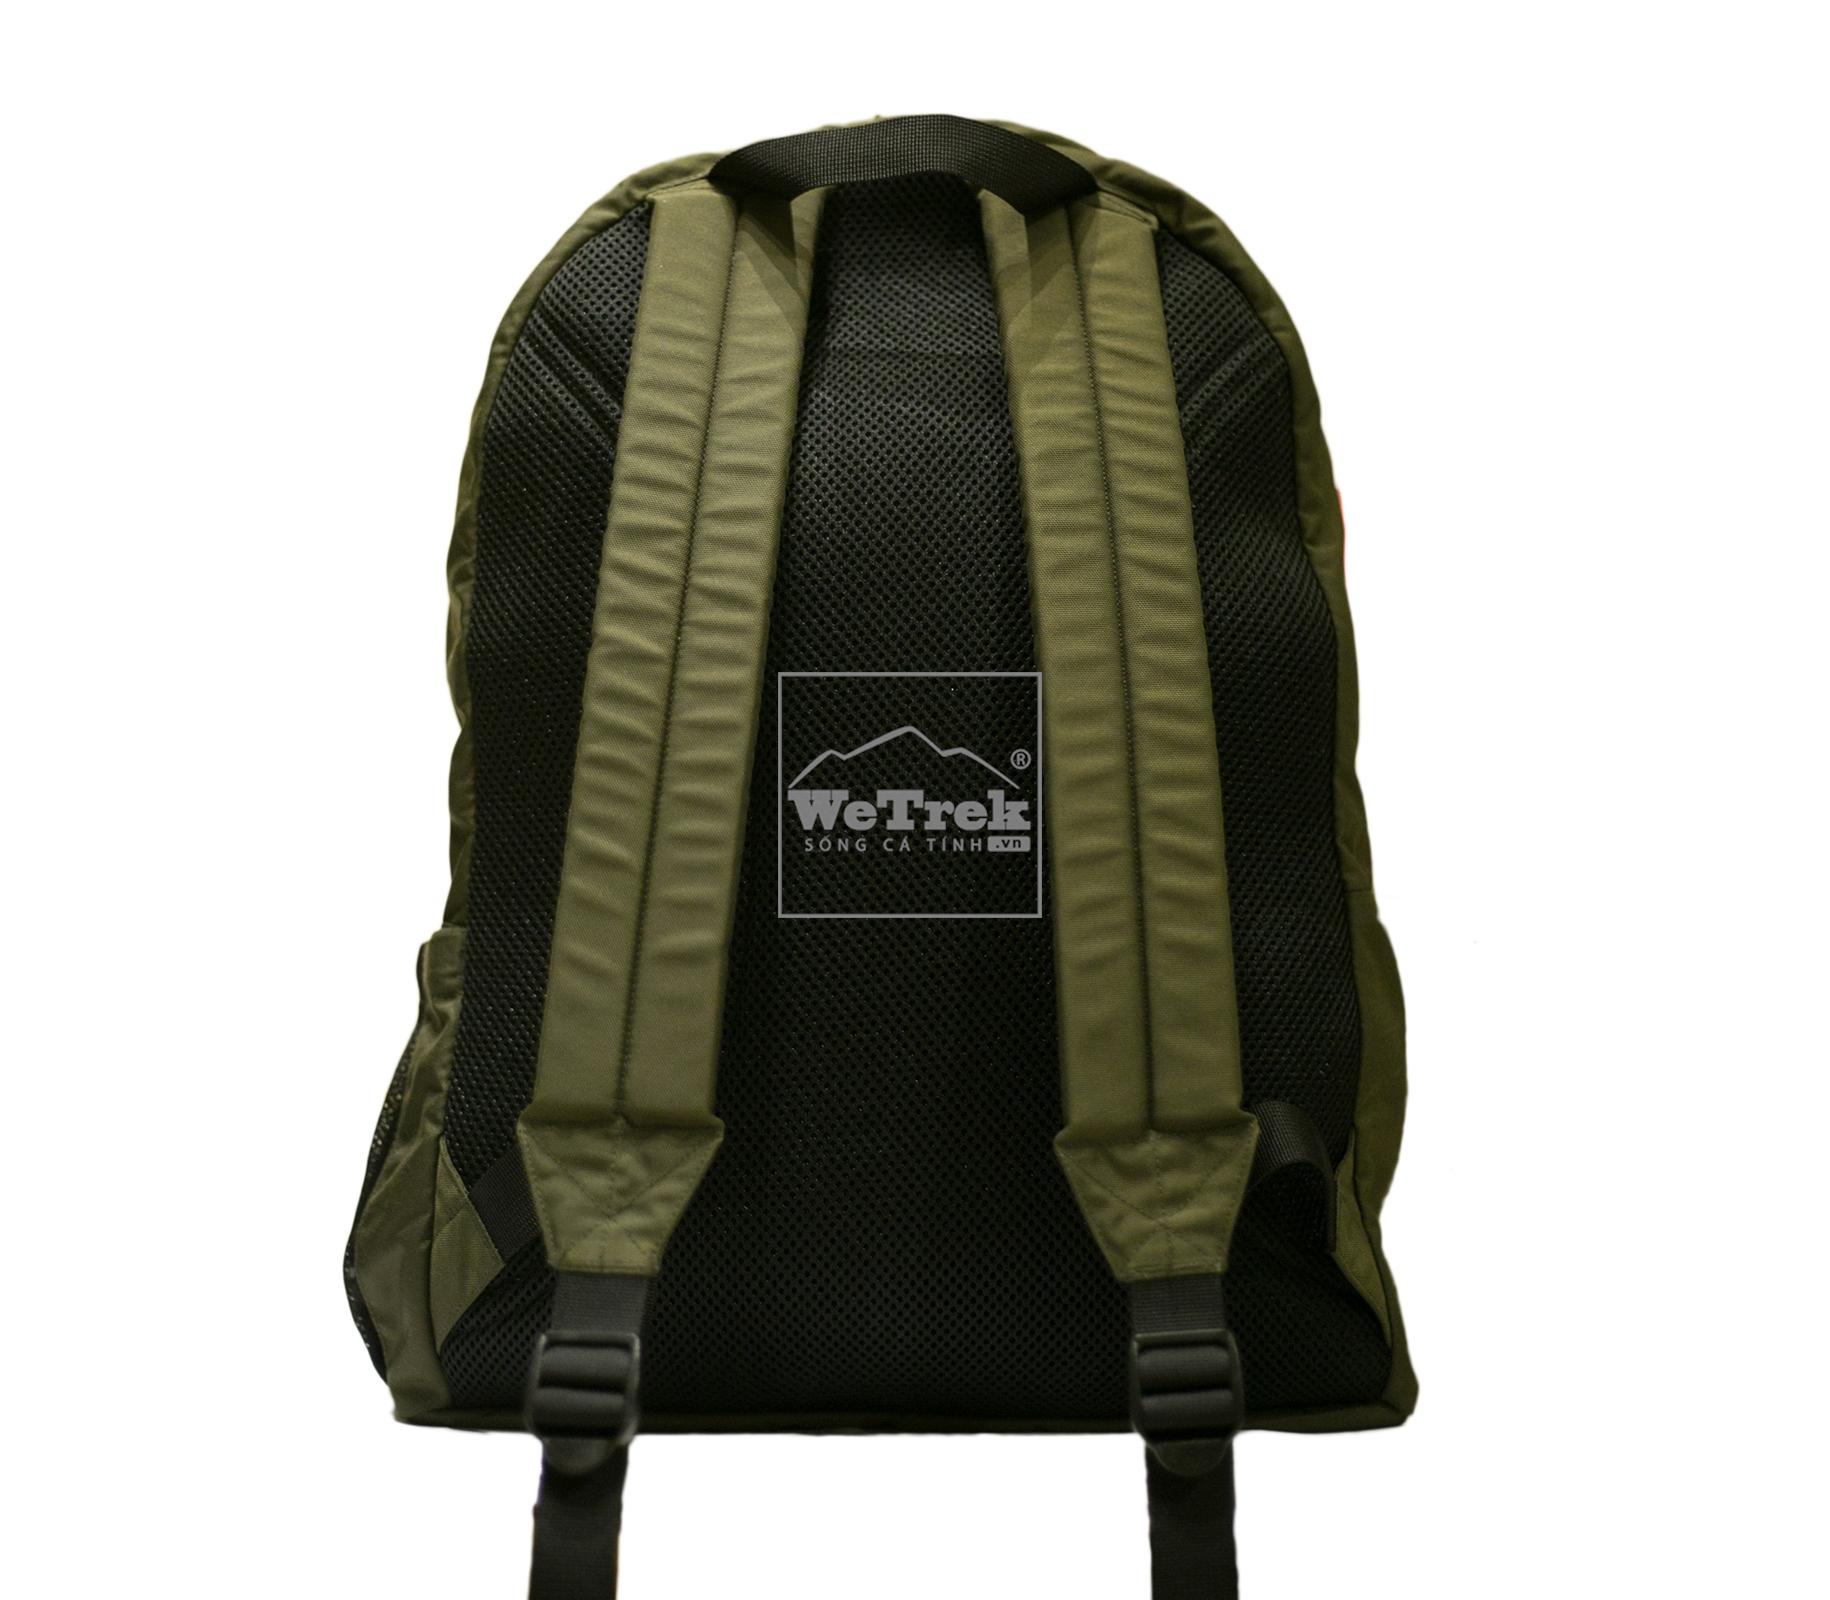 5-balo-du-lich-chong-nuoc-Weather-Guide-Waterproof-Backpack-CA-0127-8352-wetrekvn.jpg